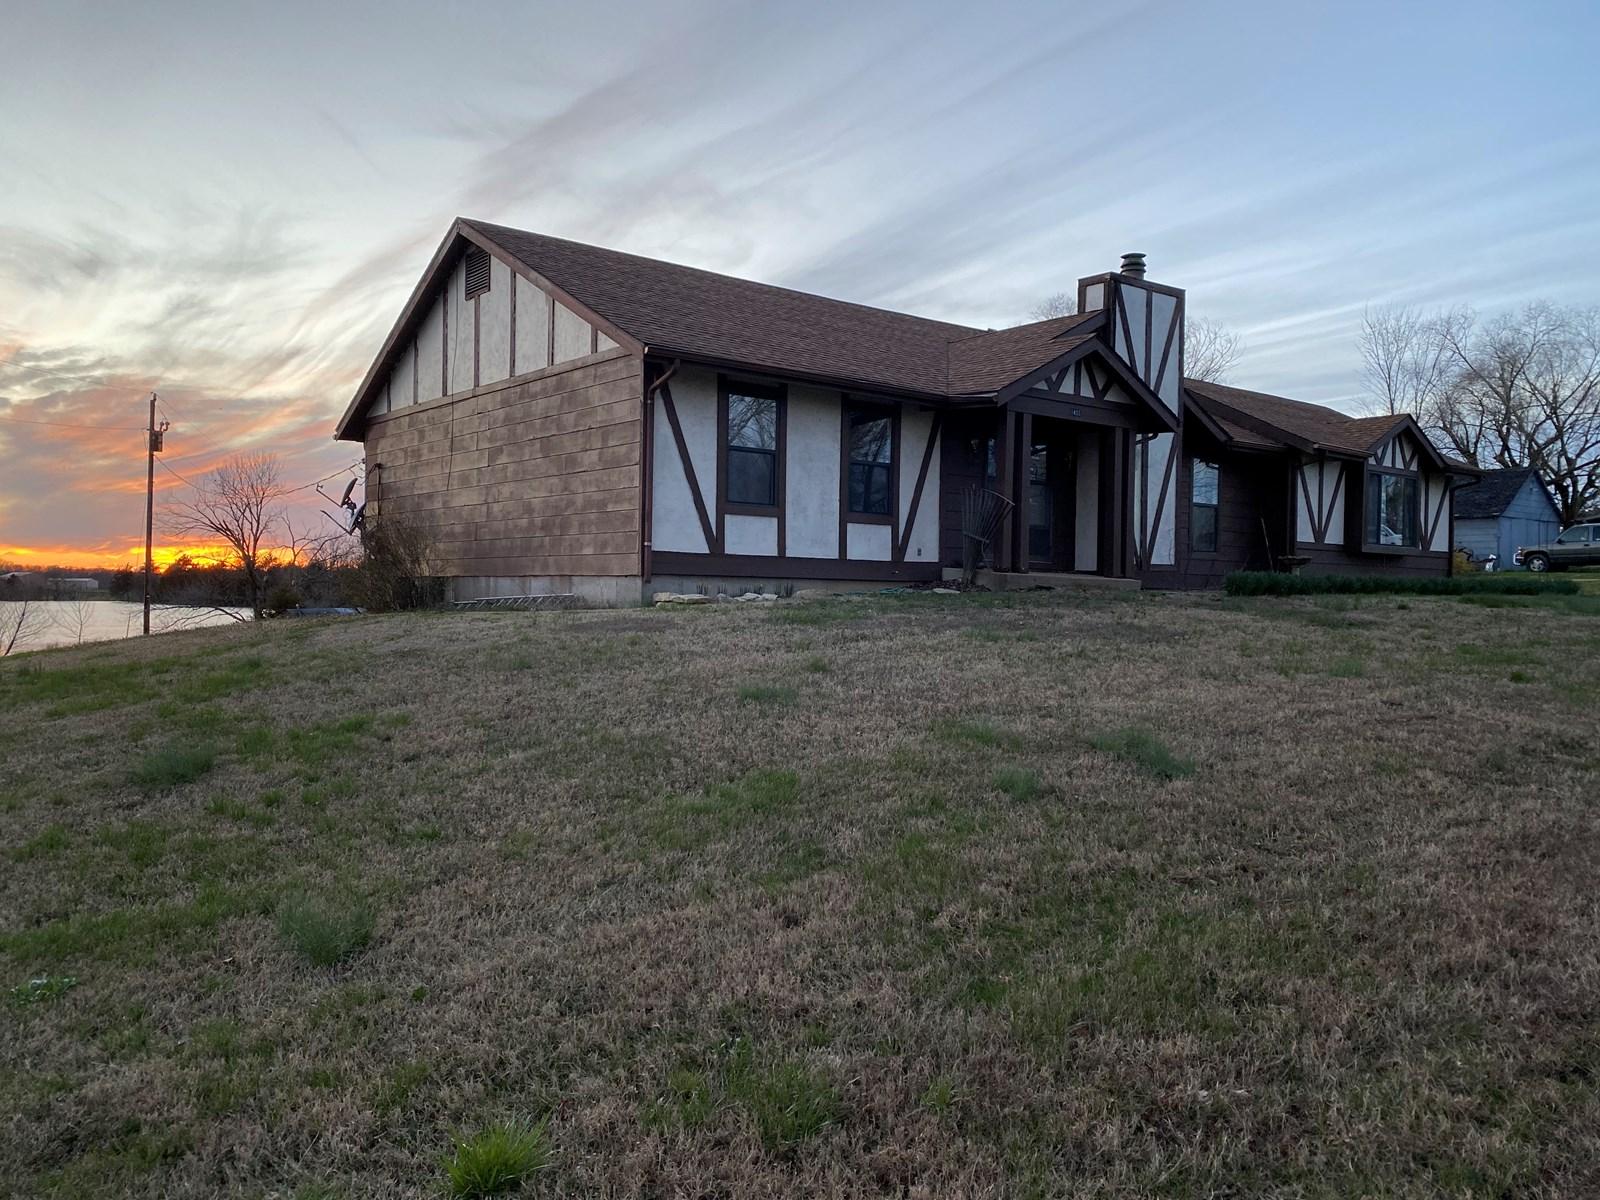 Home 12 acre lake, Vienna, Rolla, Jefferson City, Missouri,